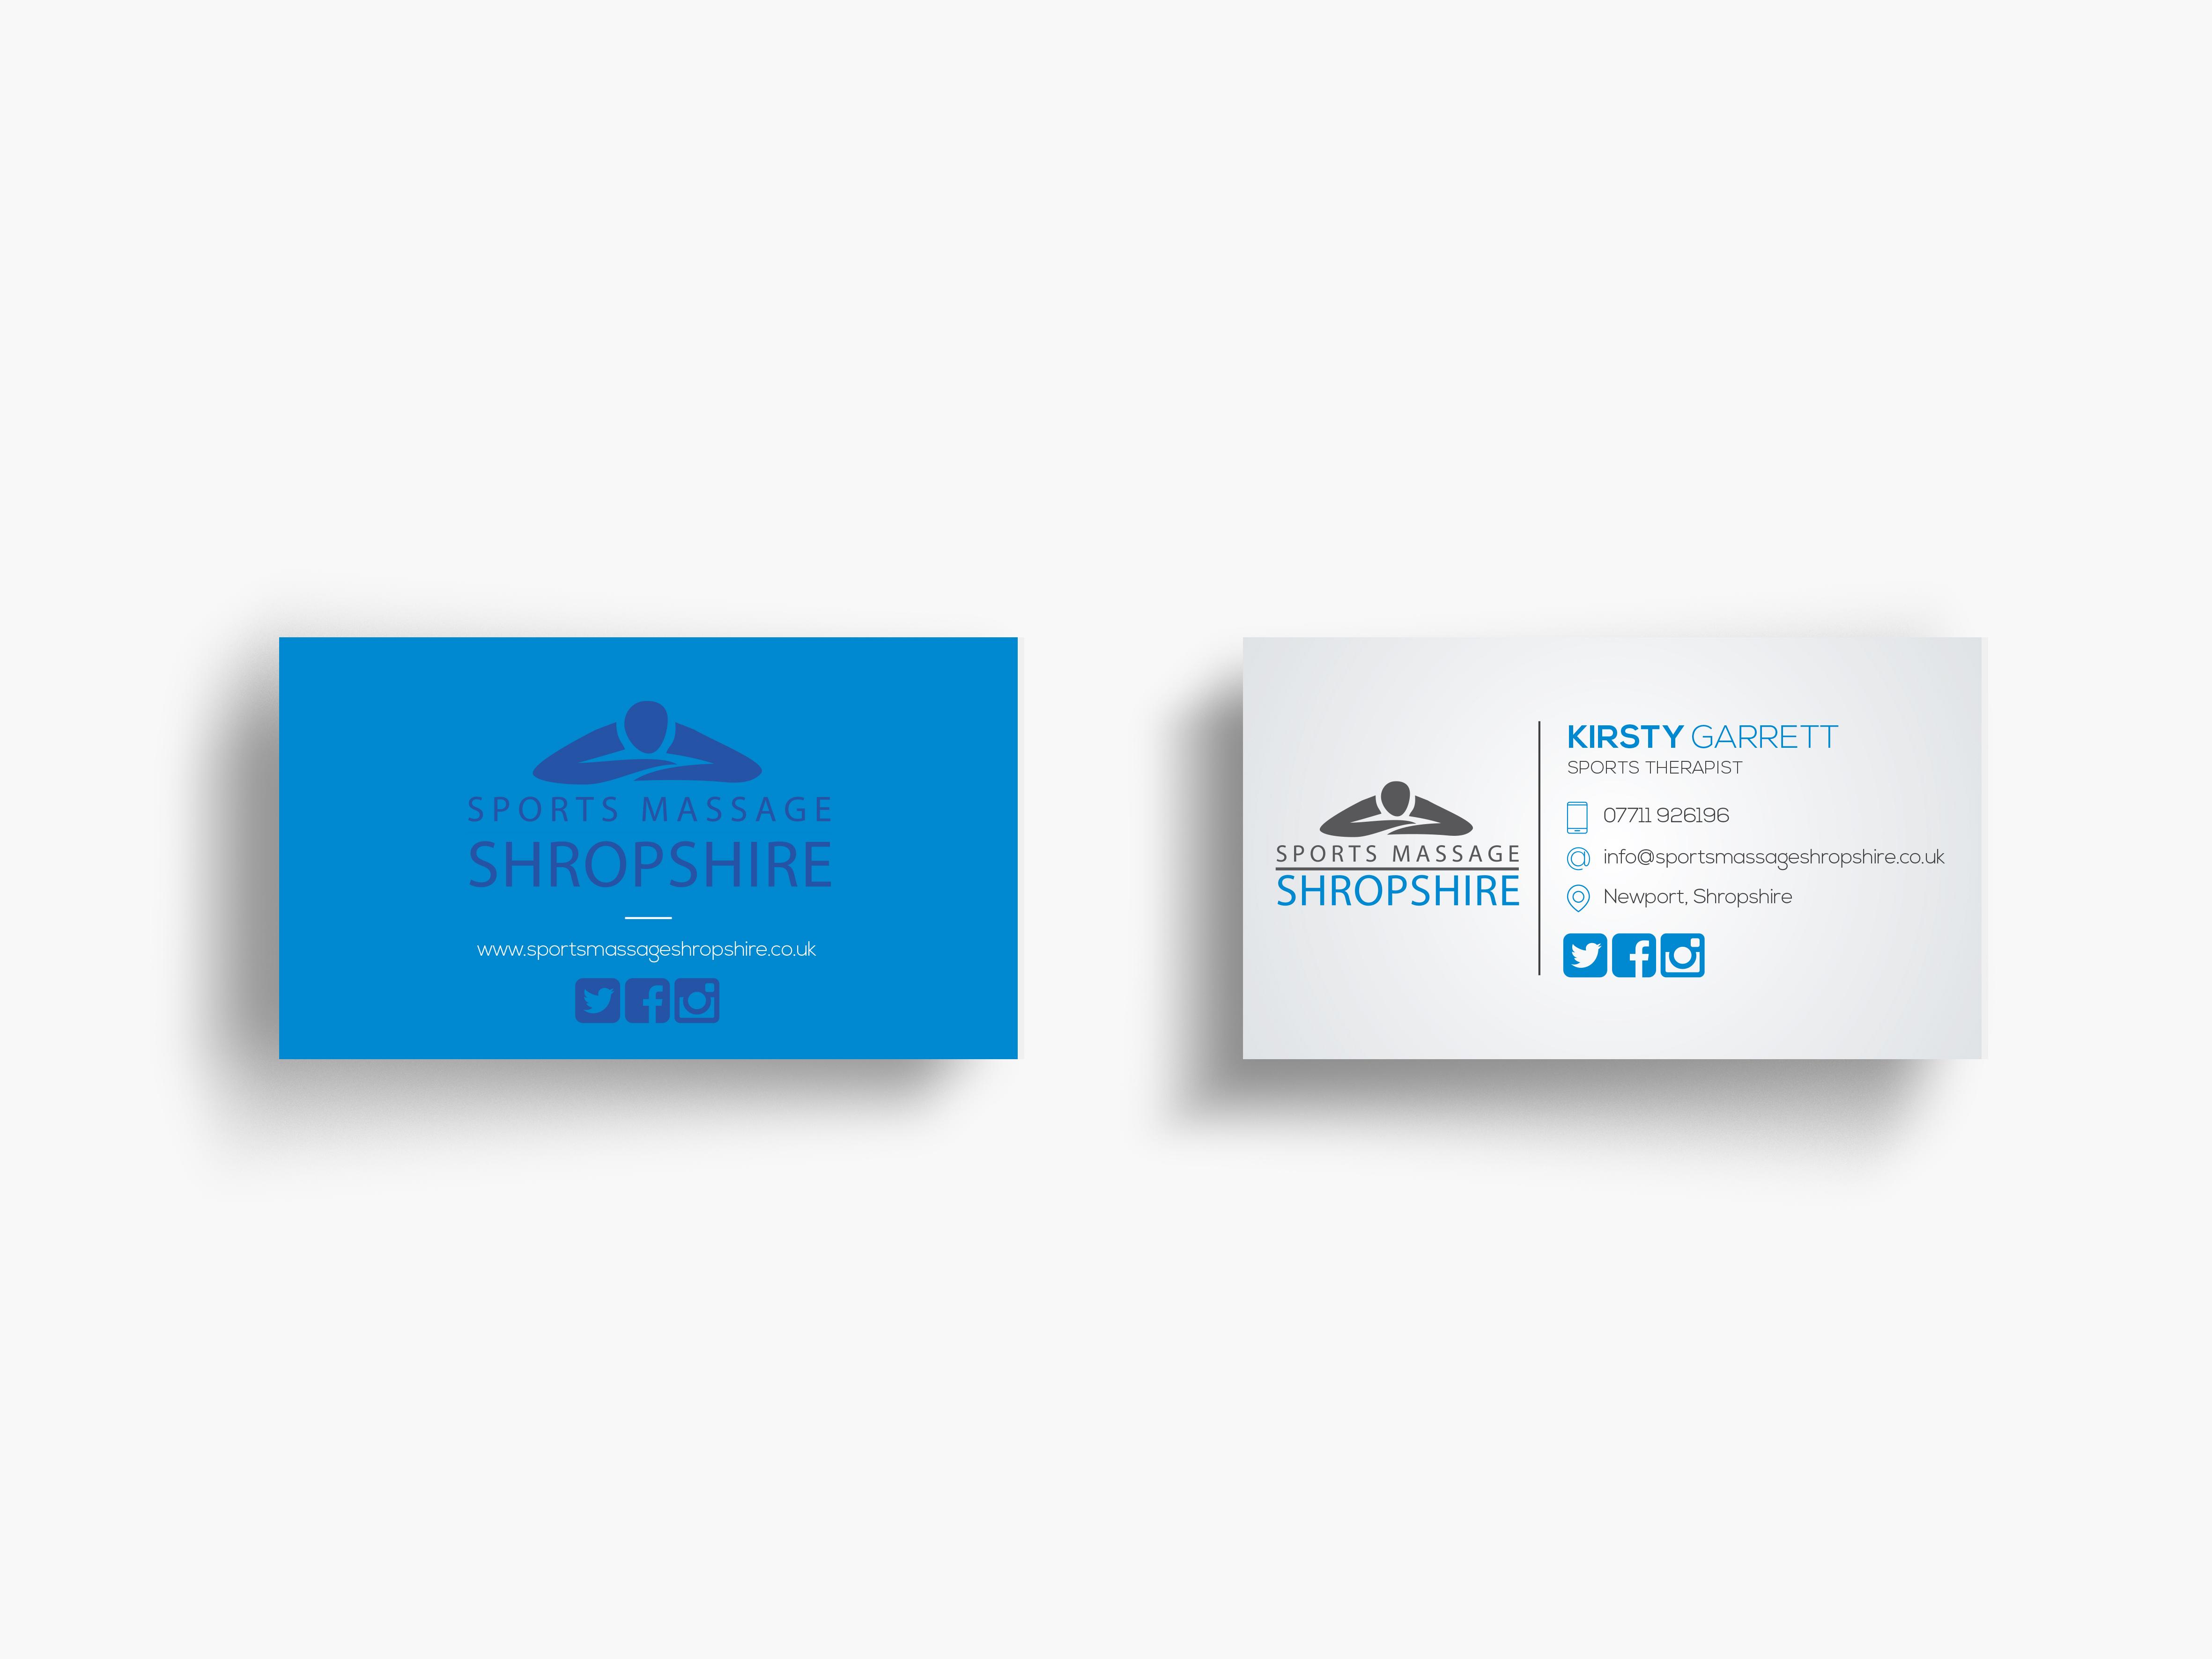 Sports Massage Shropshire Business Cards Portfolio Layout